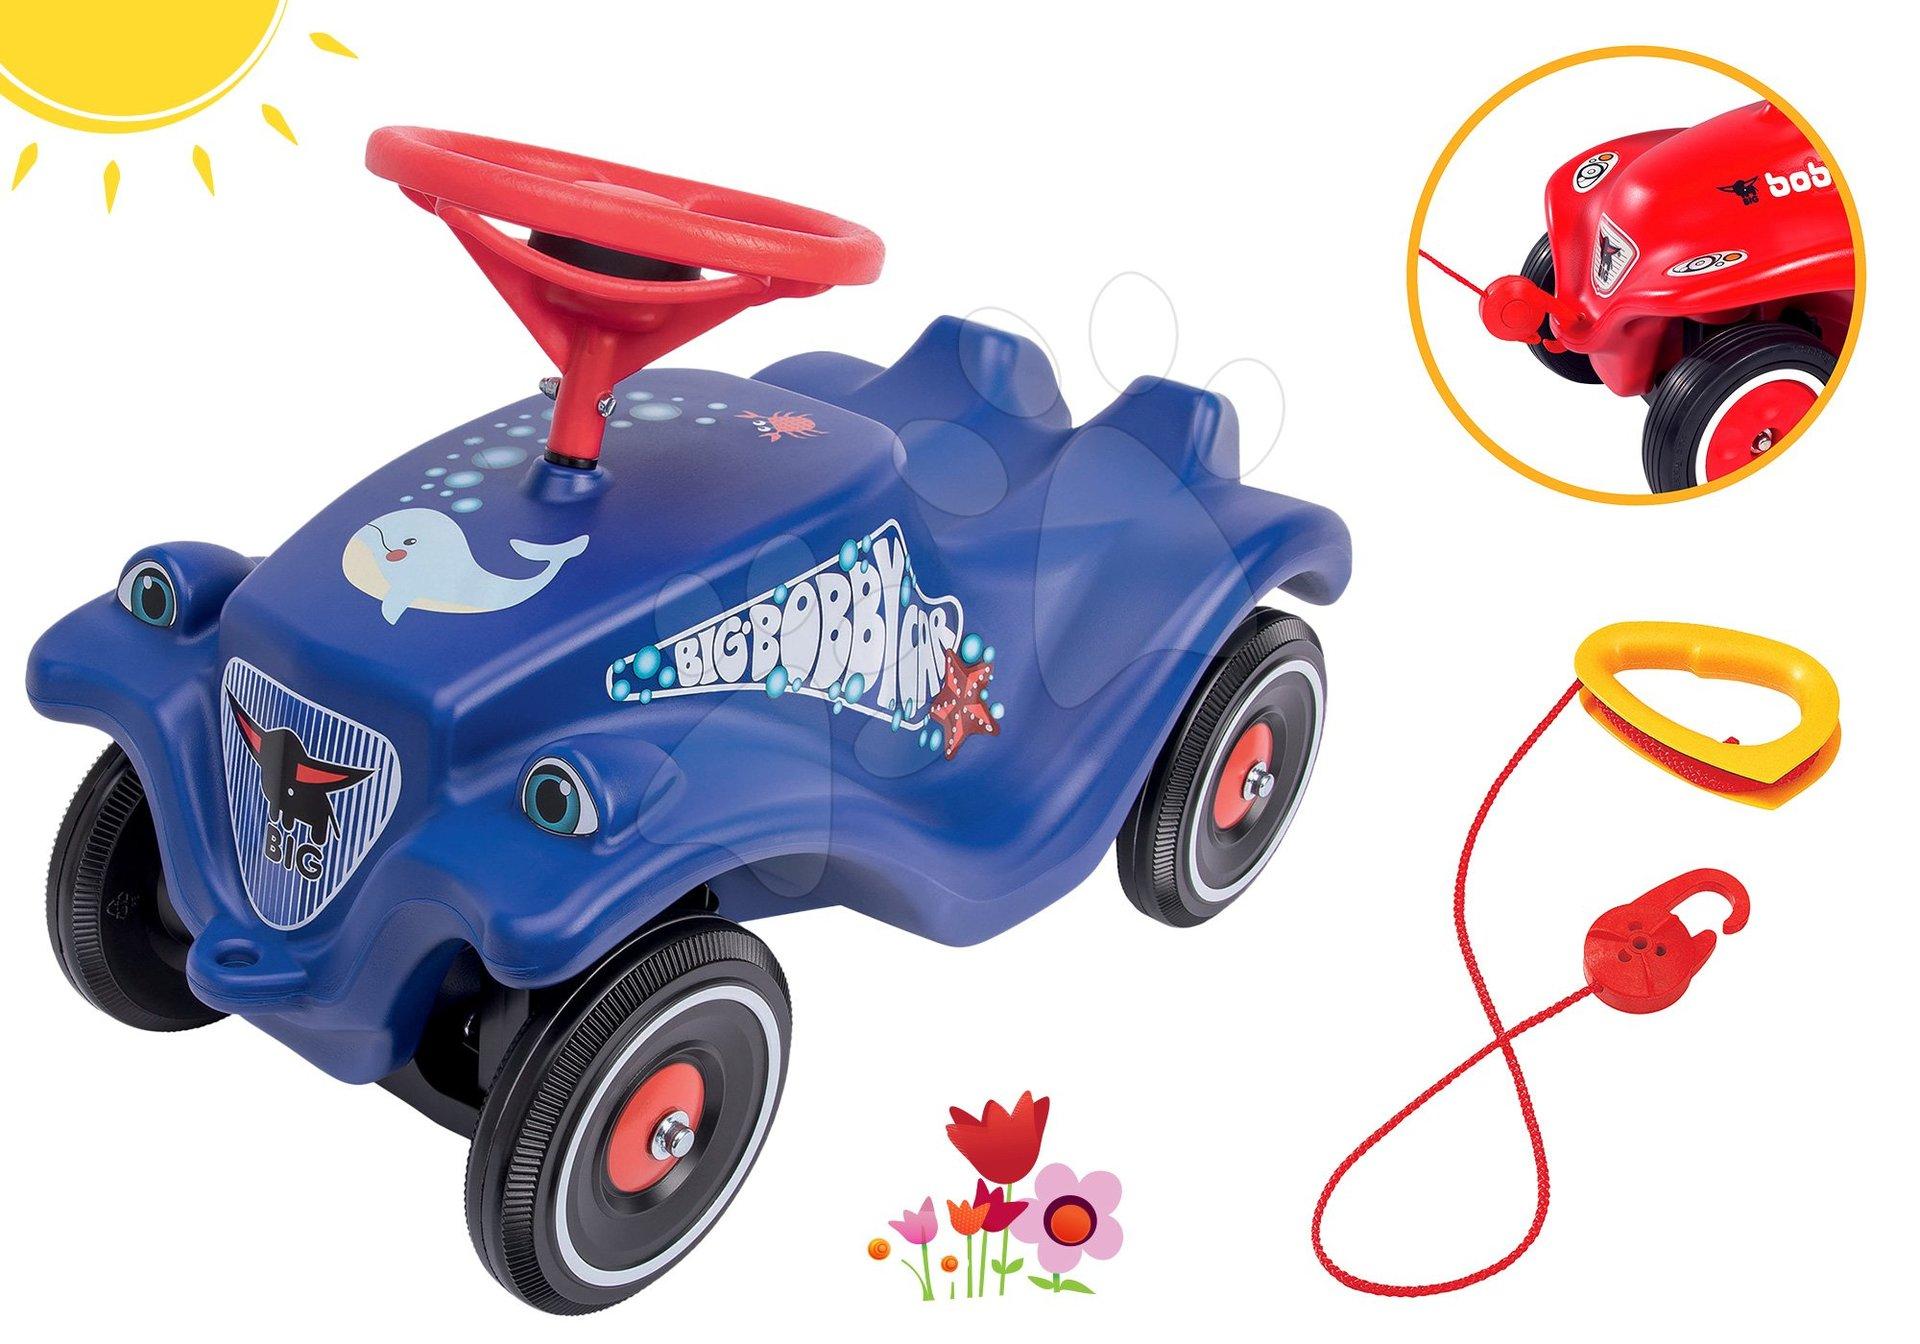 BIG set odrážedlo auto Ocean Bobby Car Classic modré a tažné lano s hákem jako dárek 56109-4